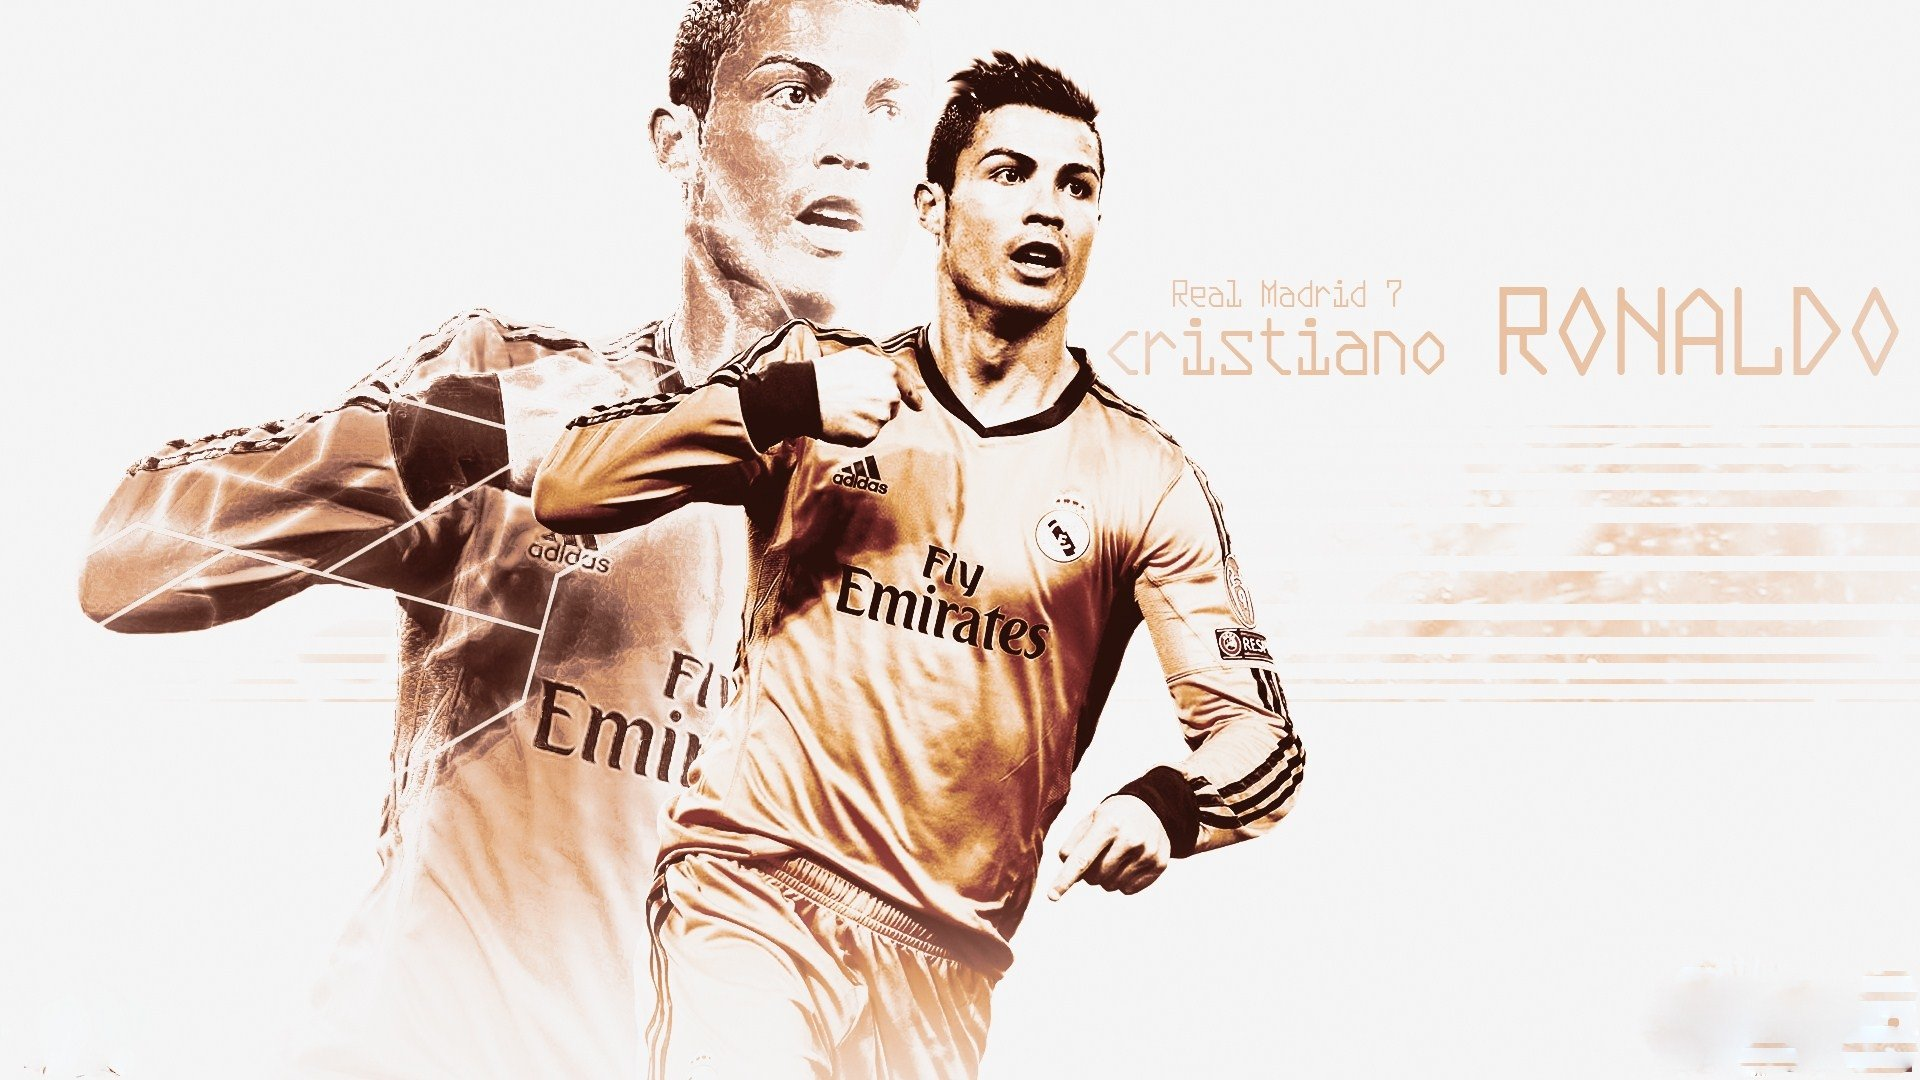 Sports - Cristiano Ronaldo  Real Madrid C.F. Wallpaper